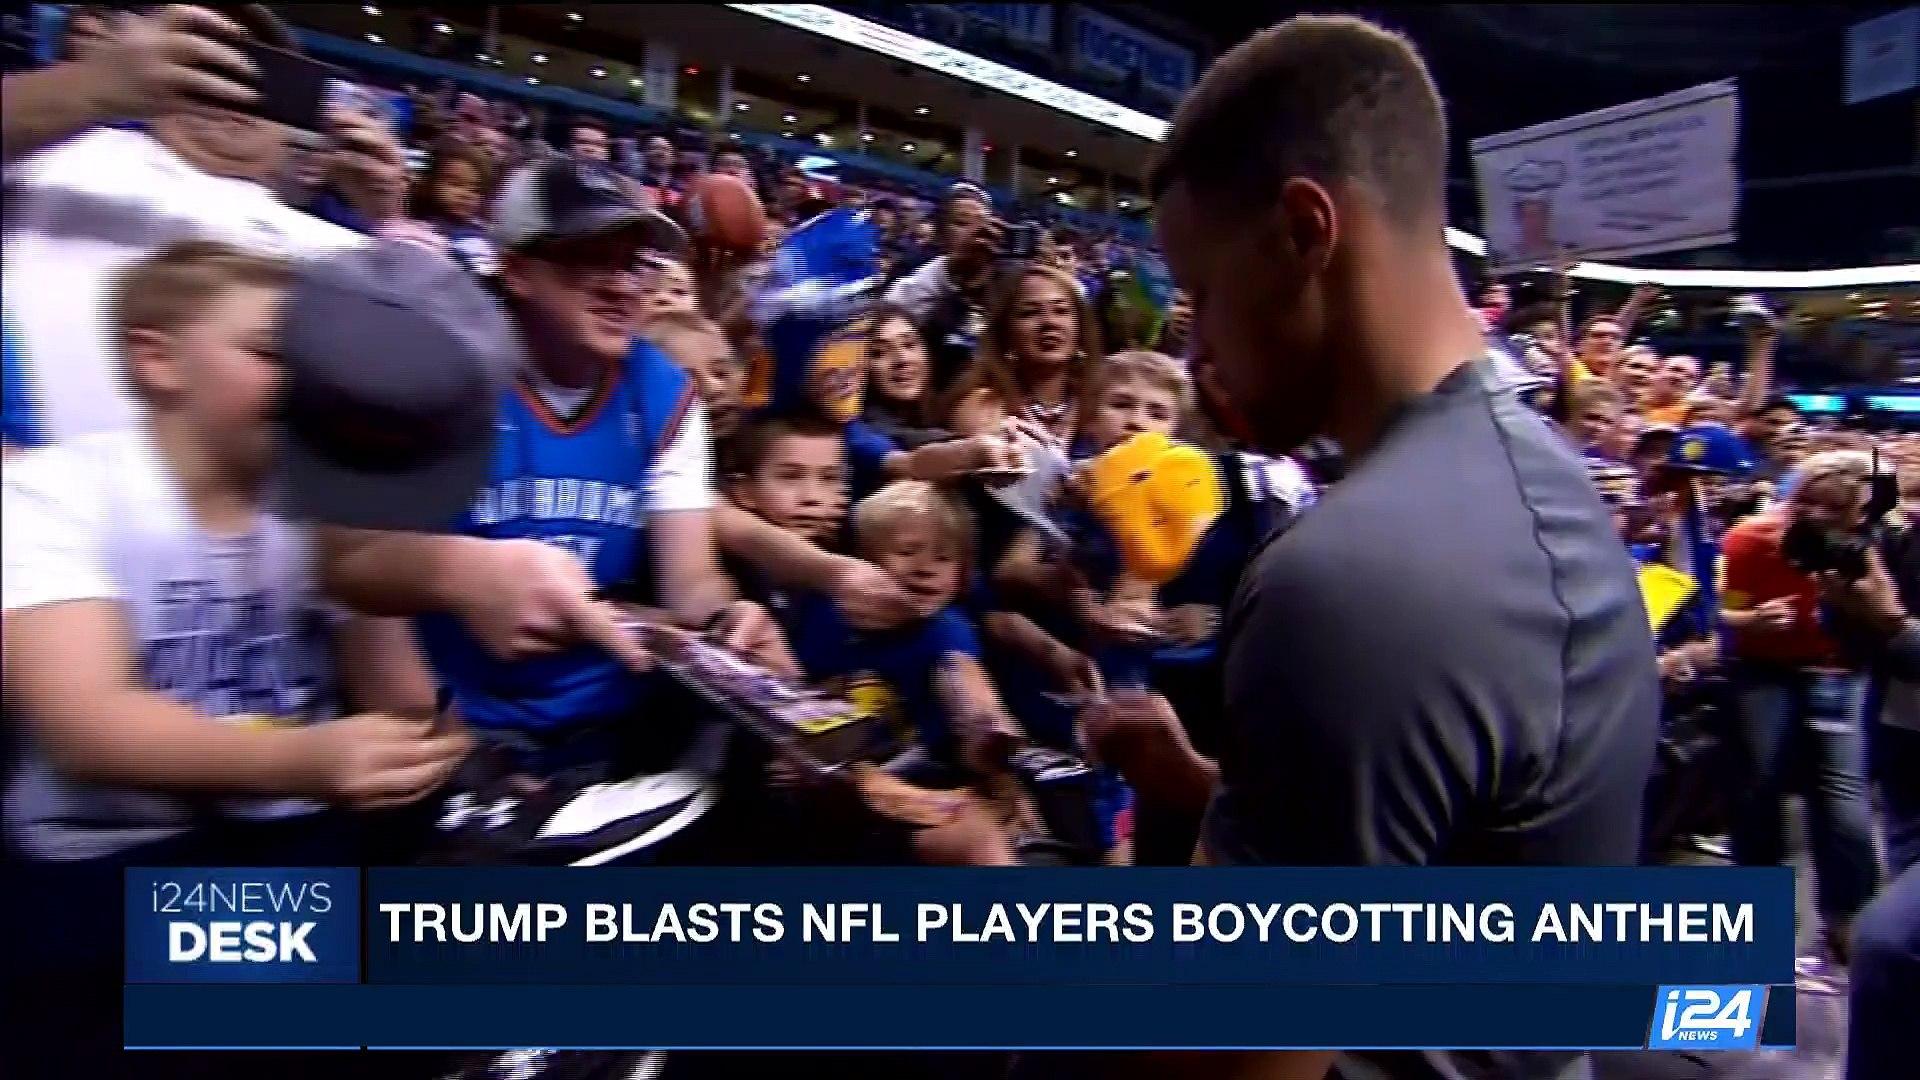 i24NEWS DESK | Trump blasts NFL players boycotting anthem | Sunday, September 24th 2017